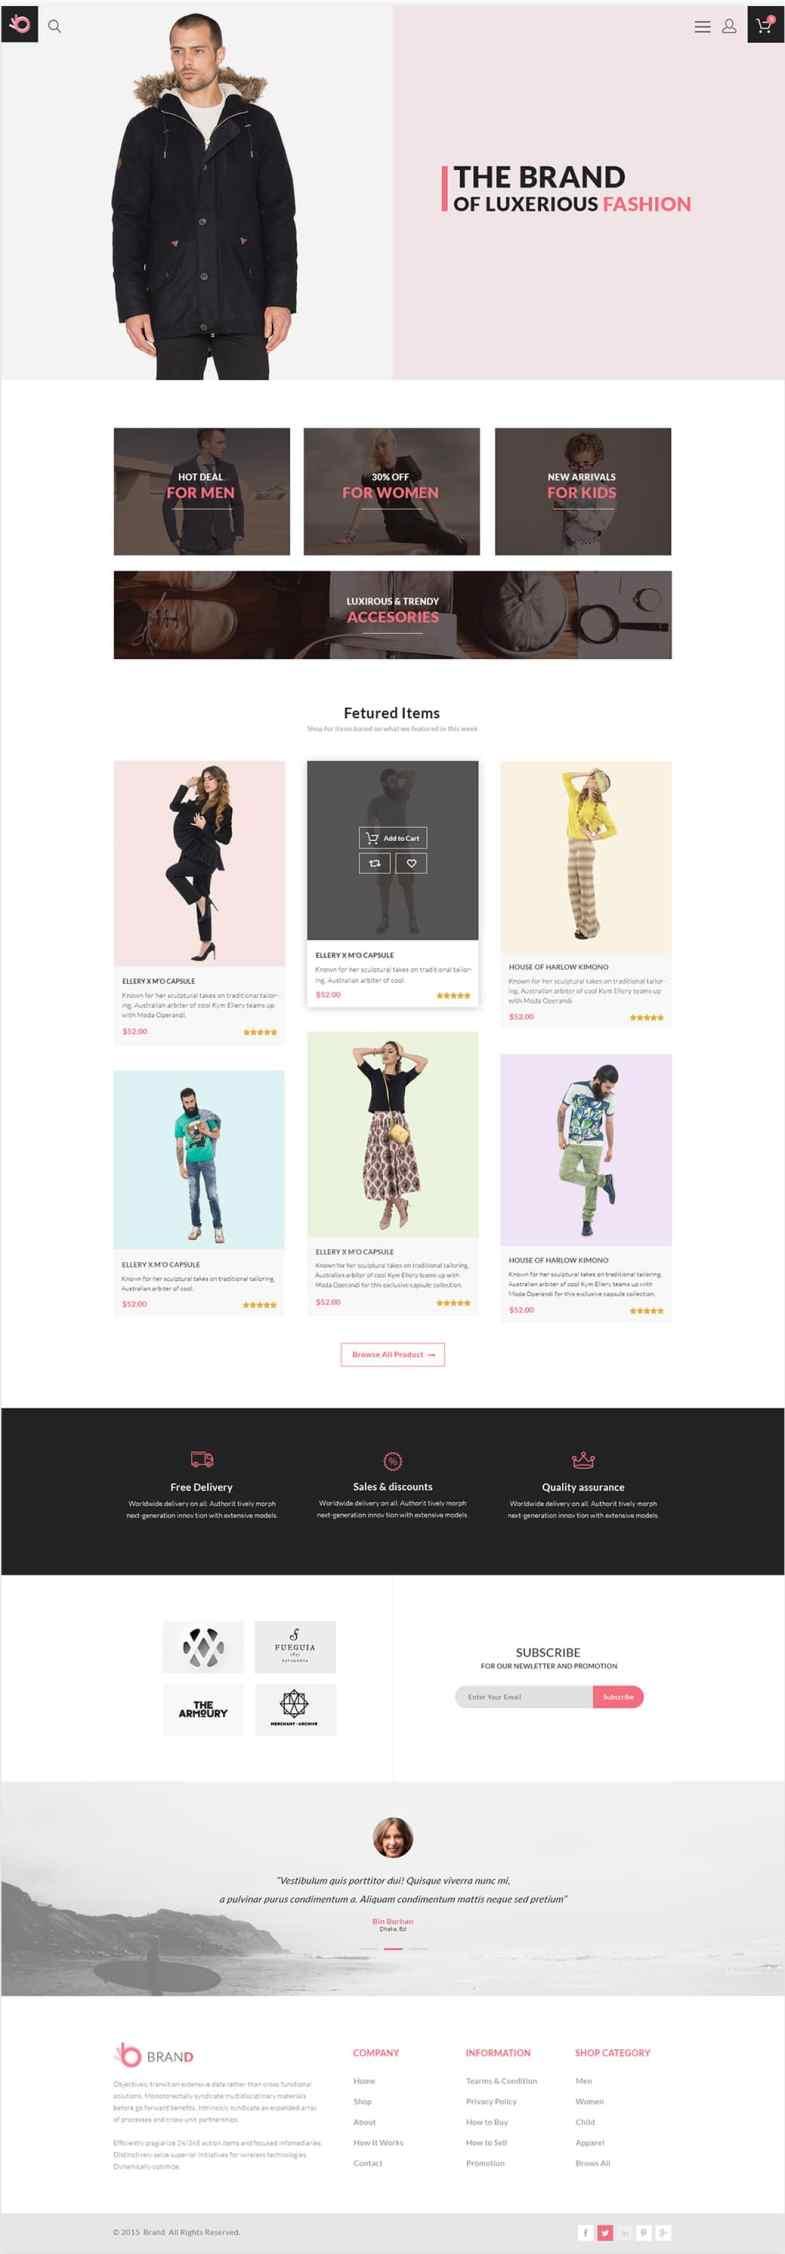 Brand - Free Fashion Store Template PSD Бесплатные шаблоны для интернет-магазина psd - Brand - Бесплатные шаблоны для интернет-магазина PSD